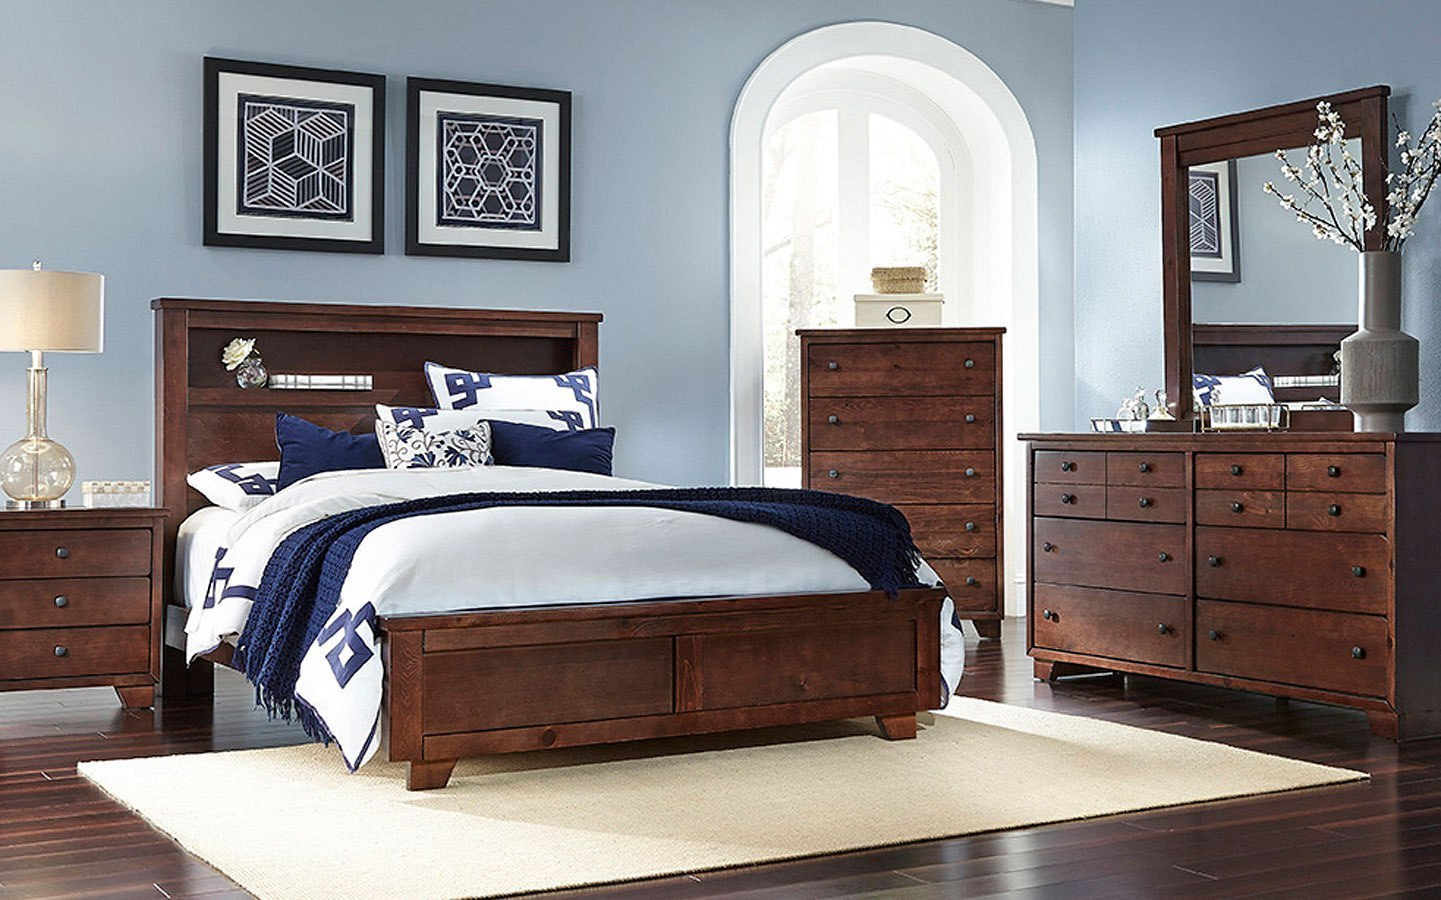 Diego Bookcase Bedroom Set (Espresso Pine) Progressive